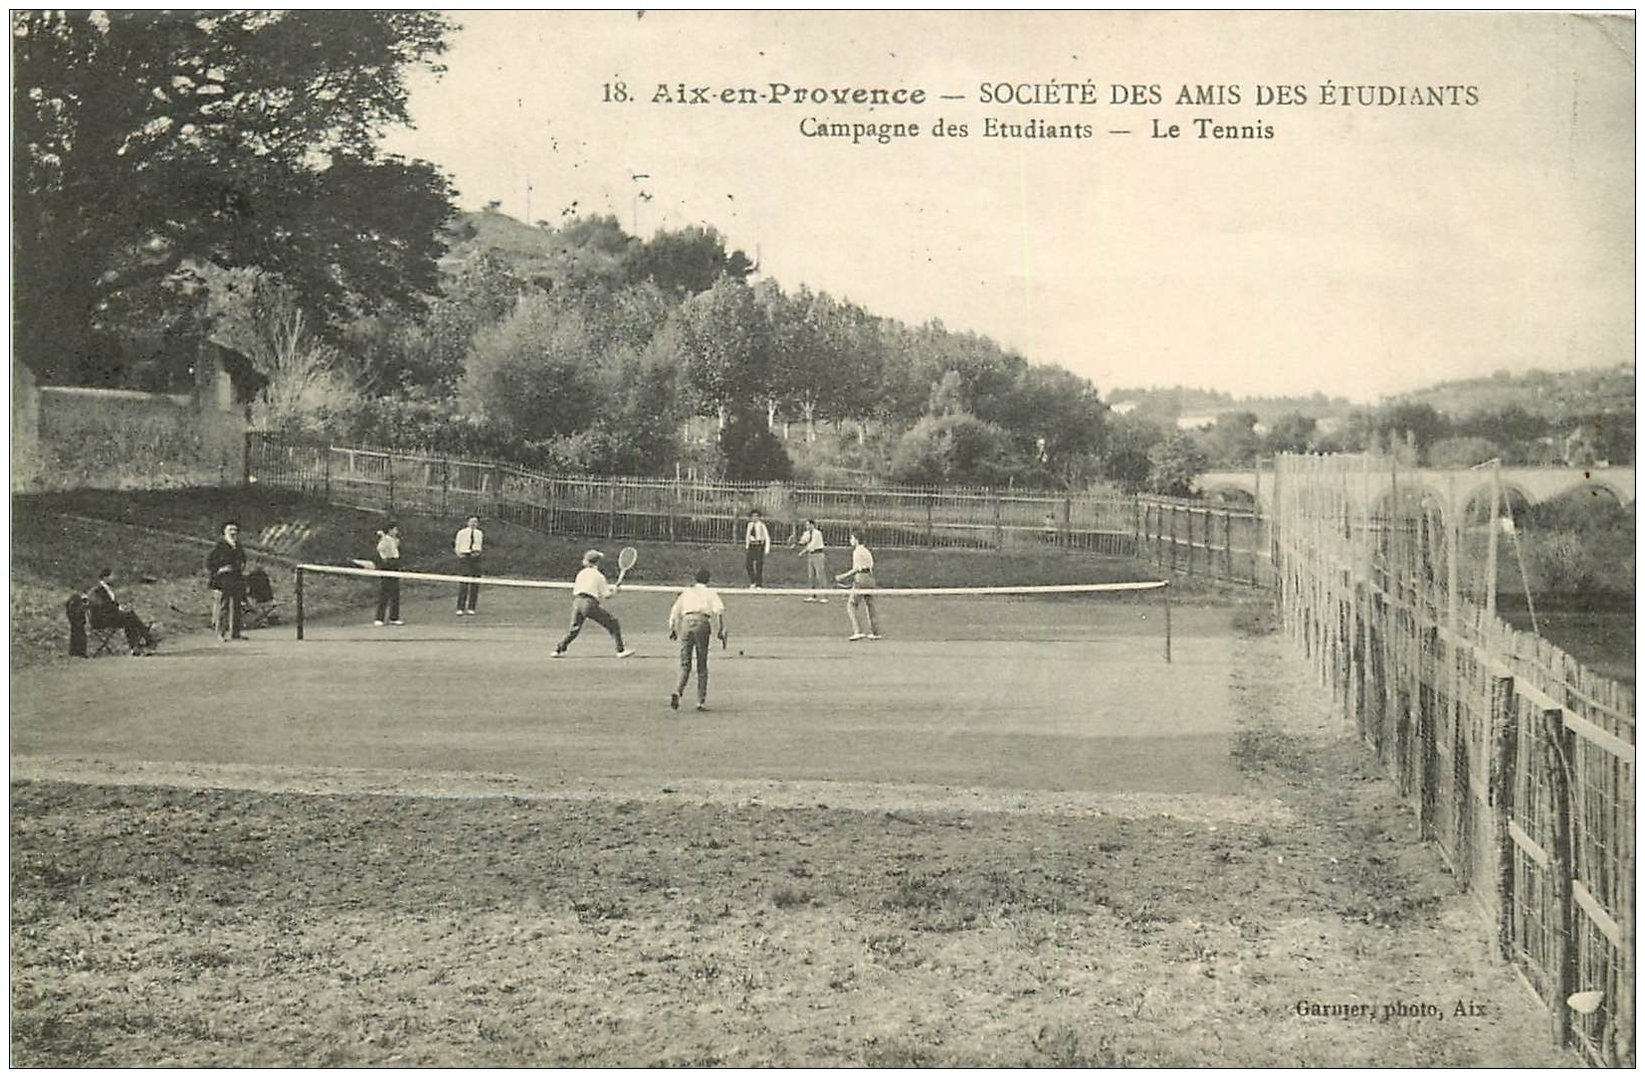 13 aix en provence le tennis soci t des amis des etudiants 1922. Black Bedroom Furniture Sets. Home Design Ideas